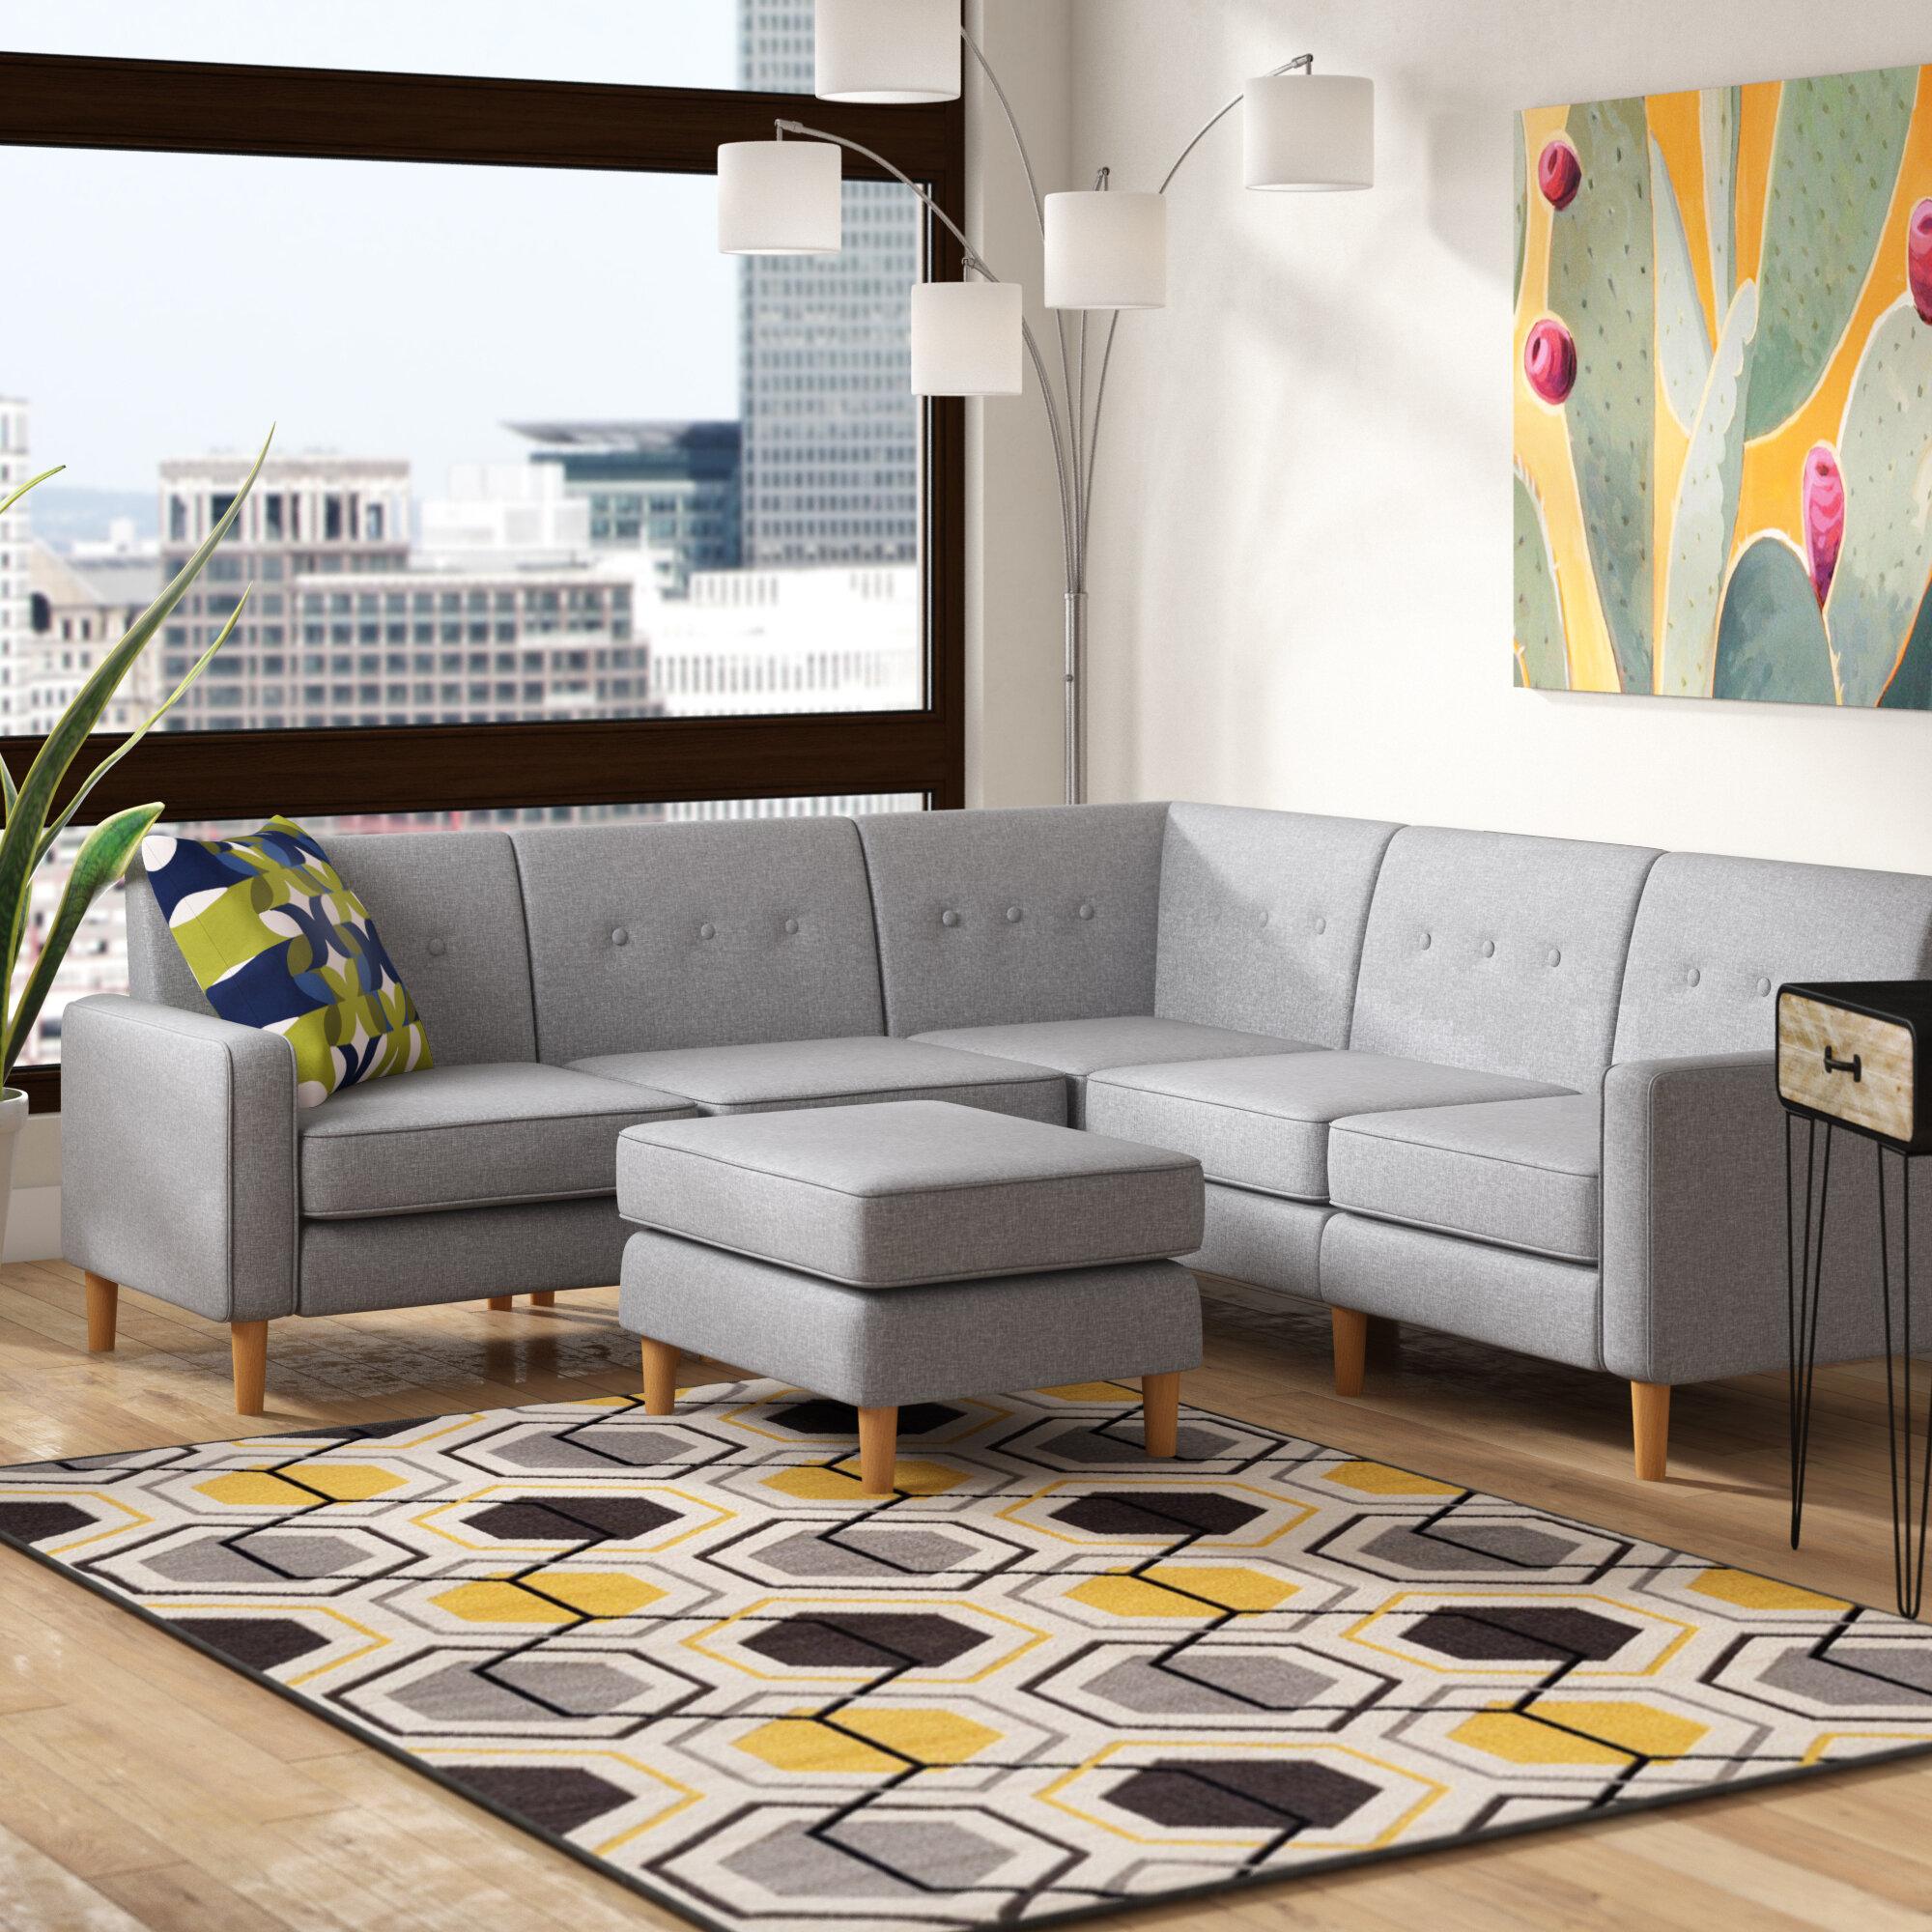 Tremendous Easton Symmetrical In Gordano Modular Sectional With Ottoman Creativecarmelina Interior Chair Design Creativecarmelinacom